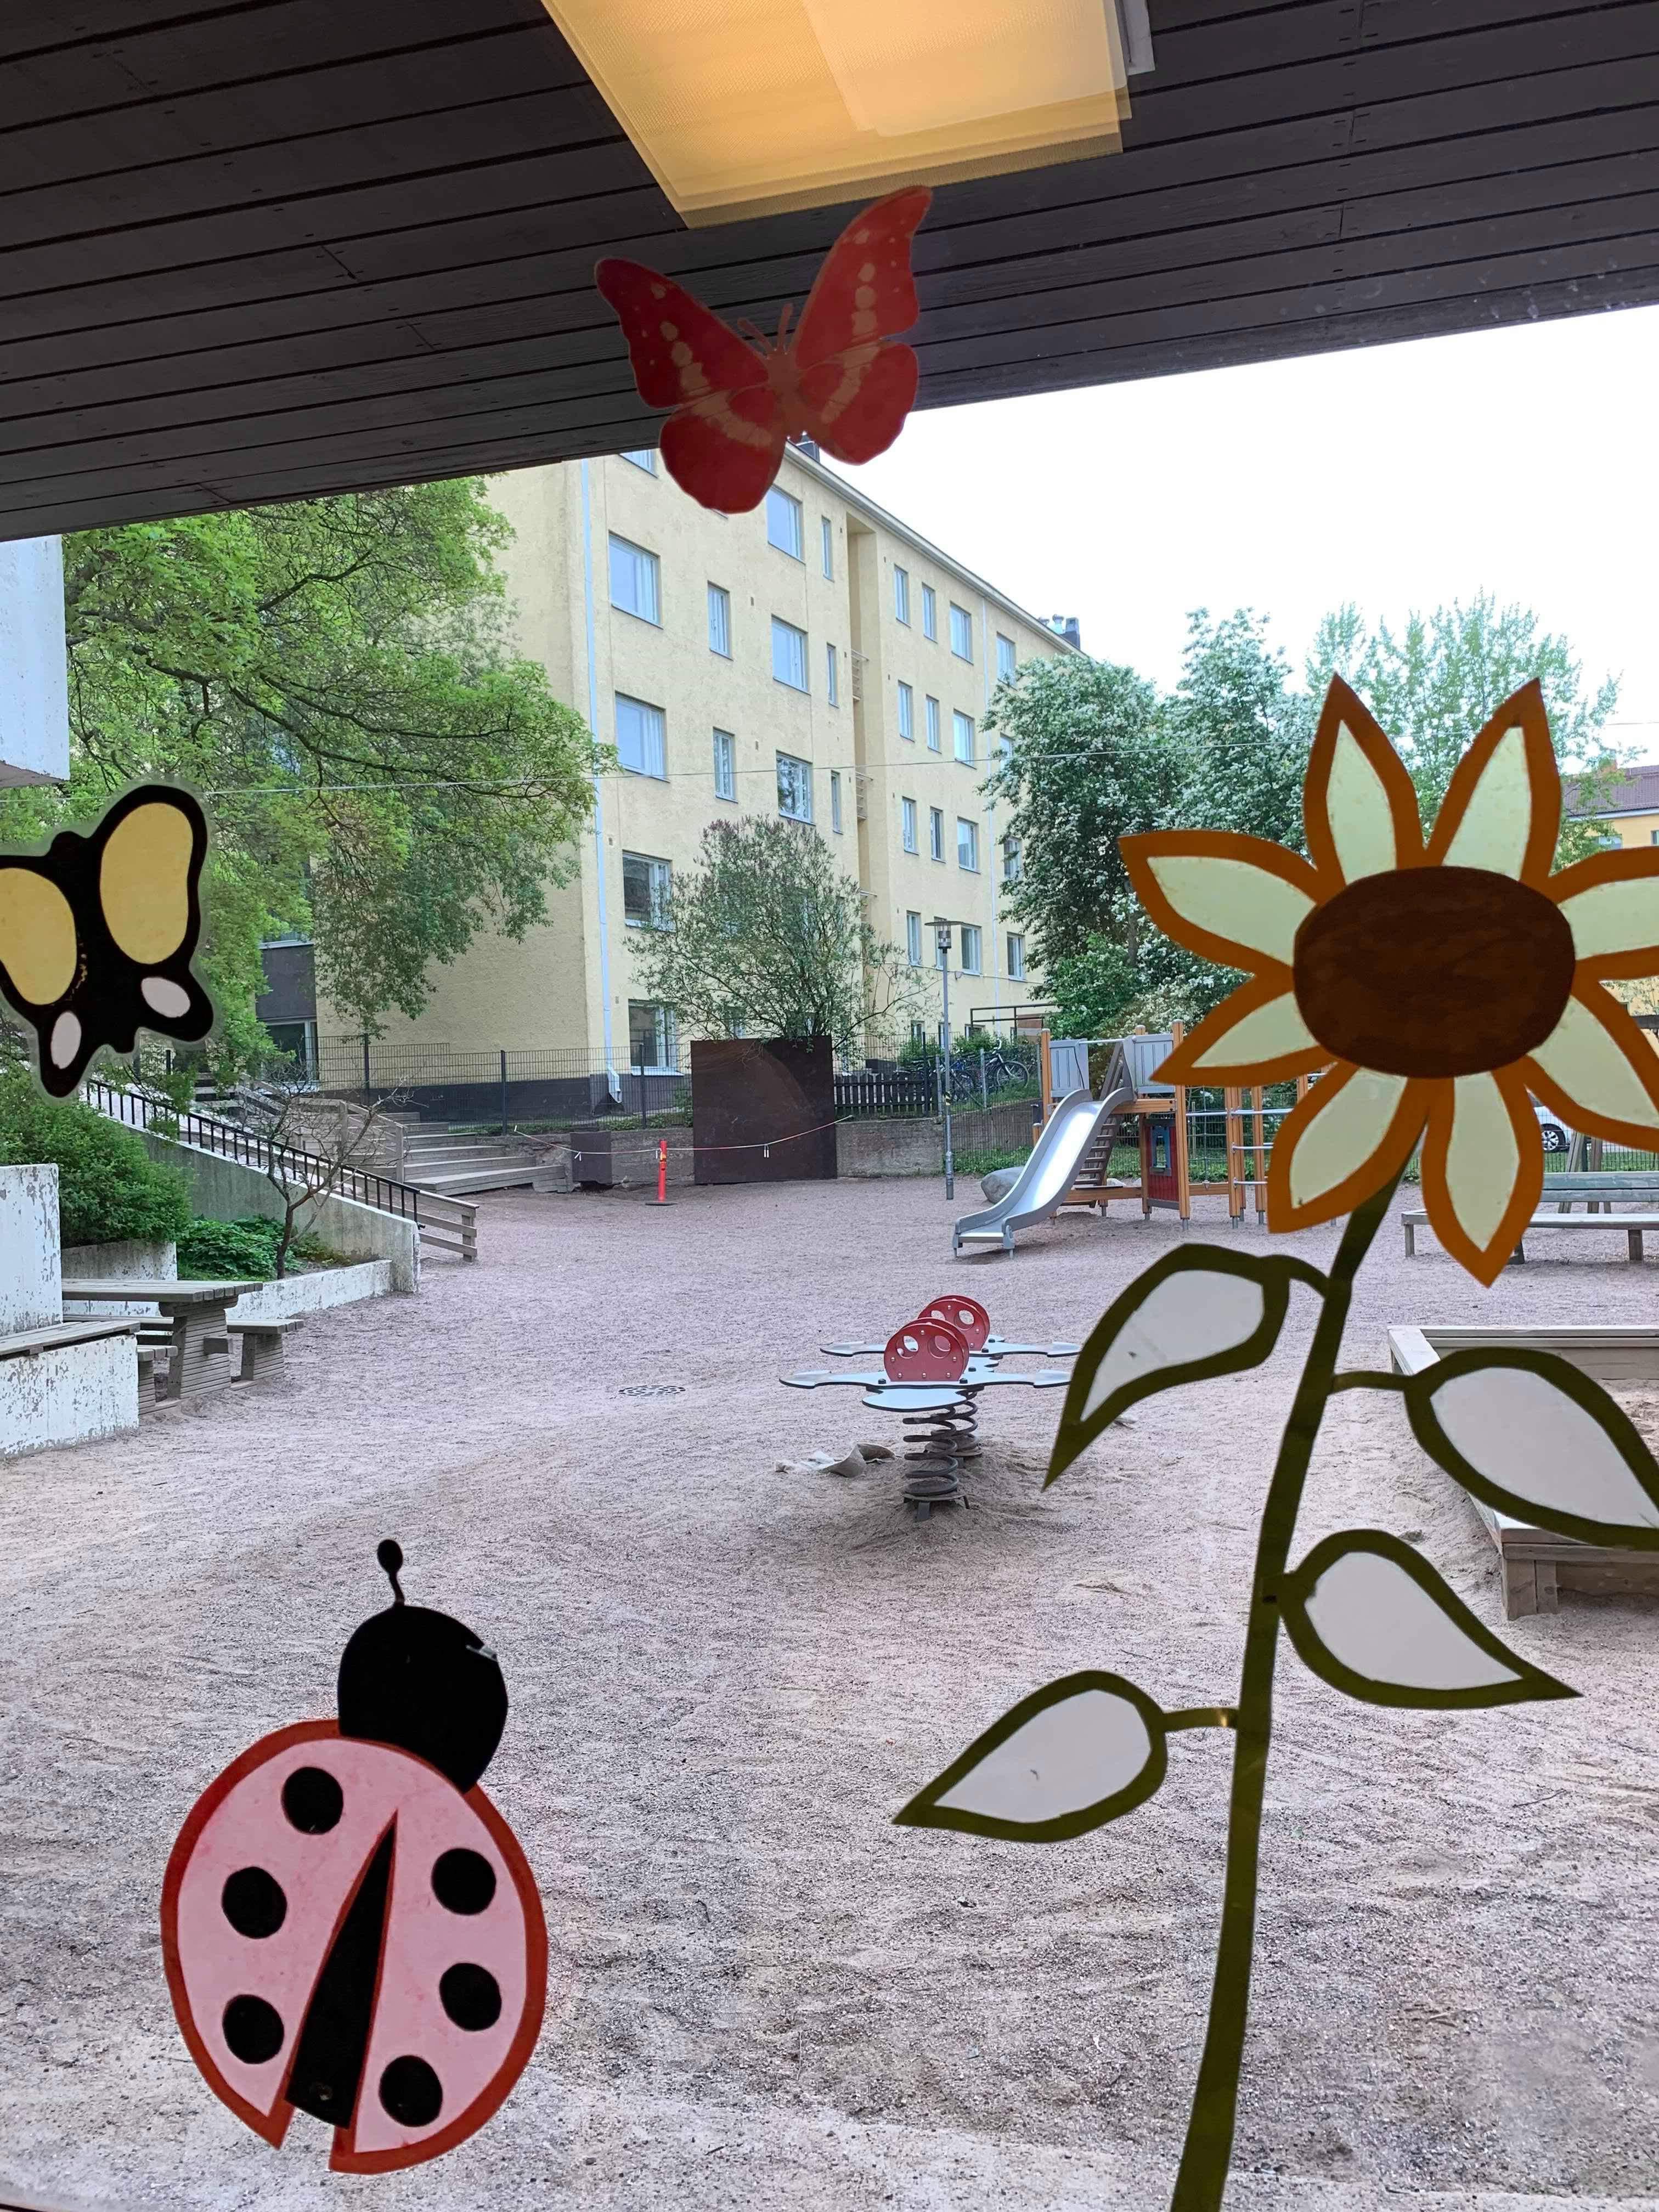 Vindu finsk barnehage